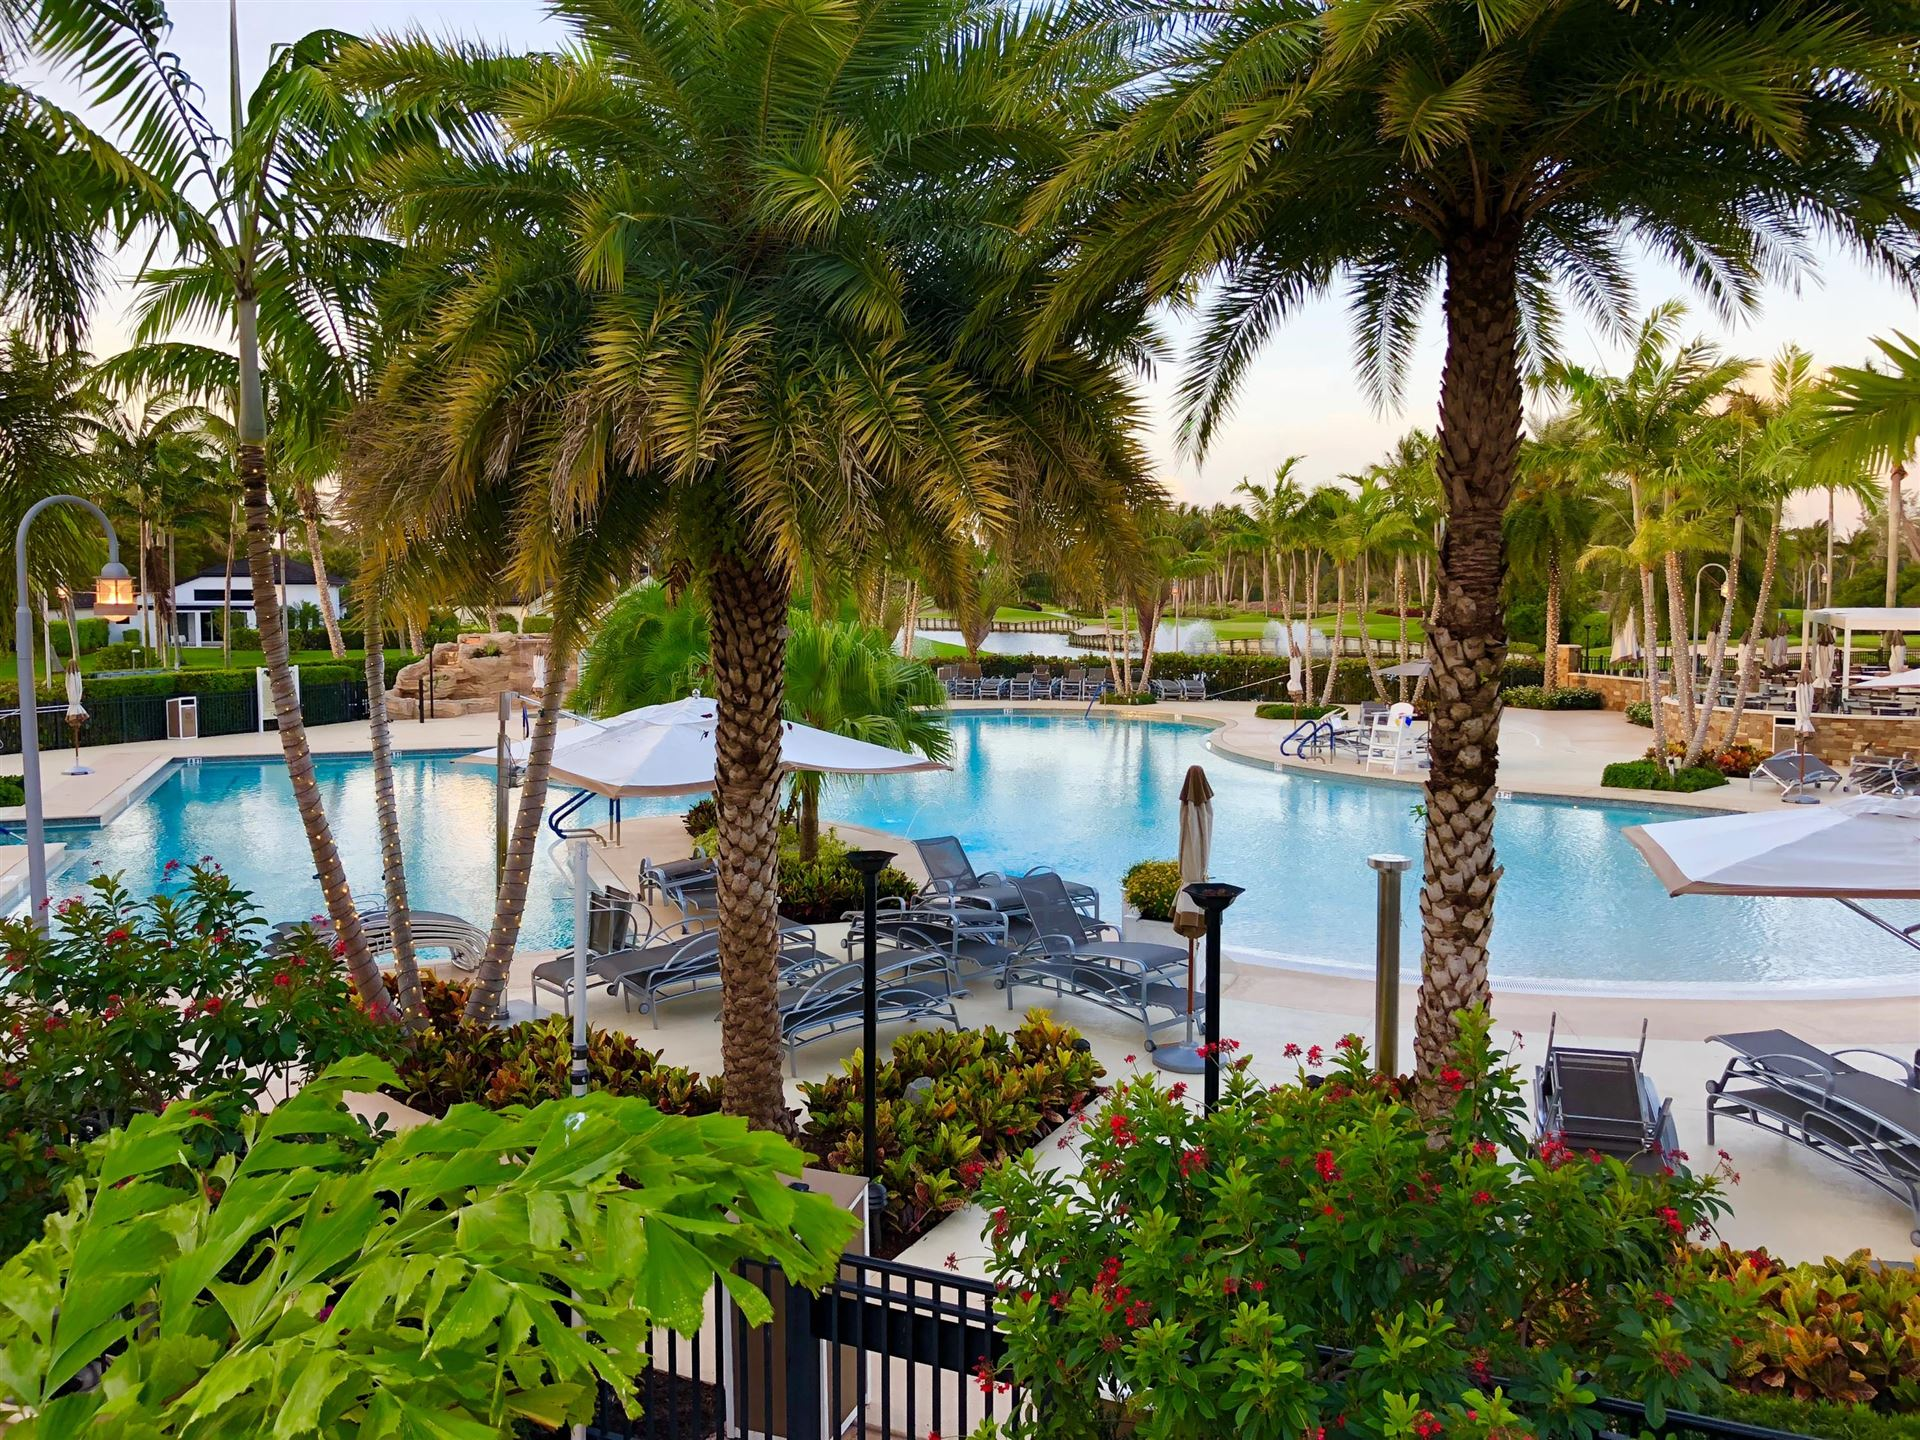 5238 Lake Catalina Drive N #C, Boca Raton, FL 33496 - #: RX-10591981